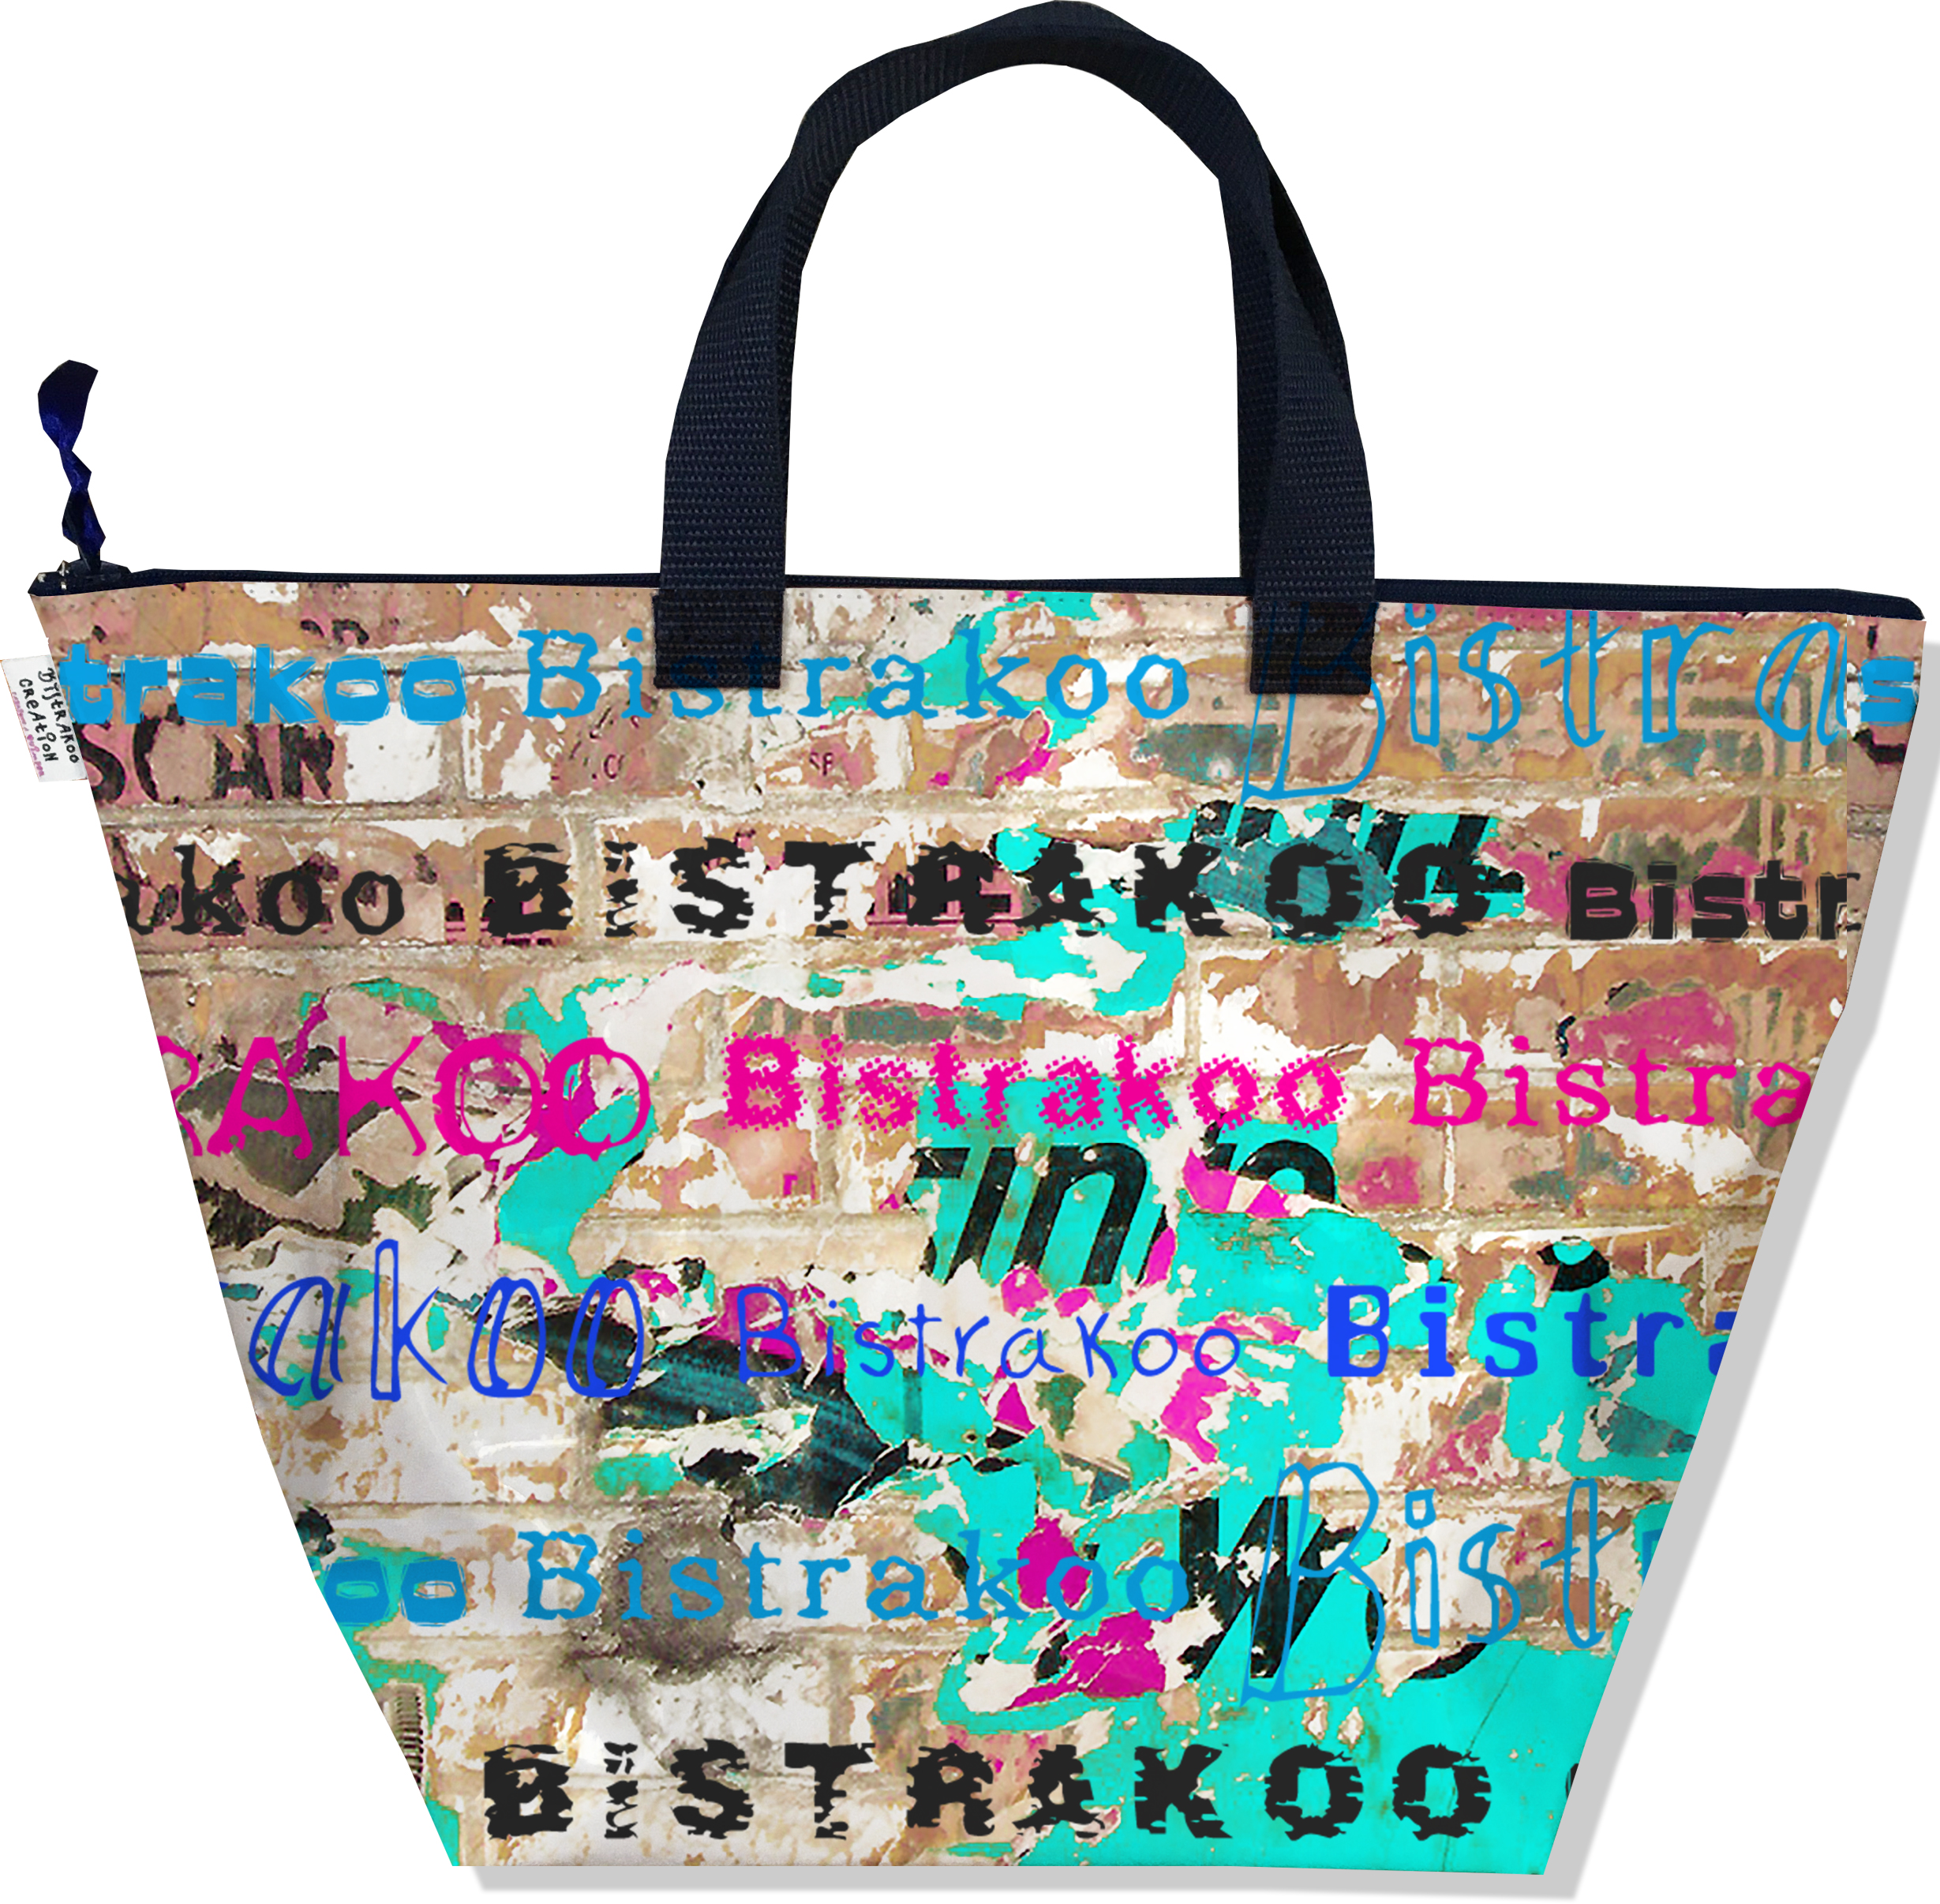 Sac à main zippé pour femme motif Street art Bistrakoo 2291